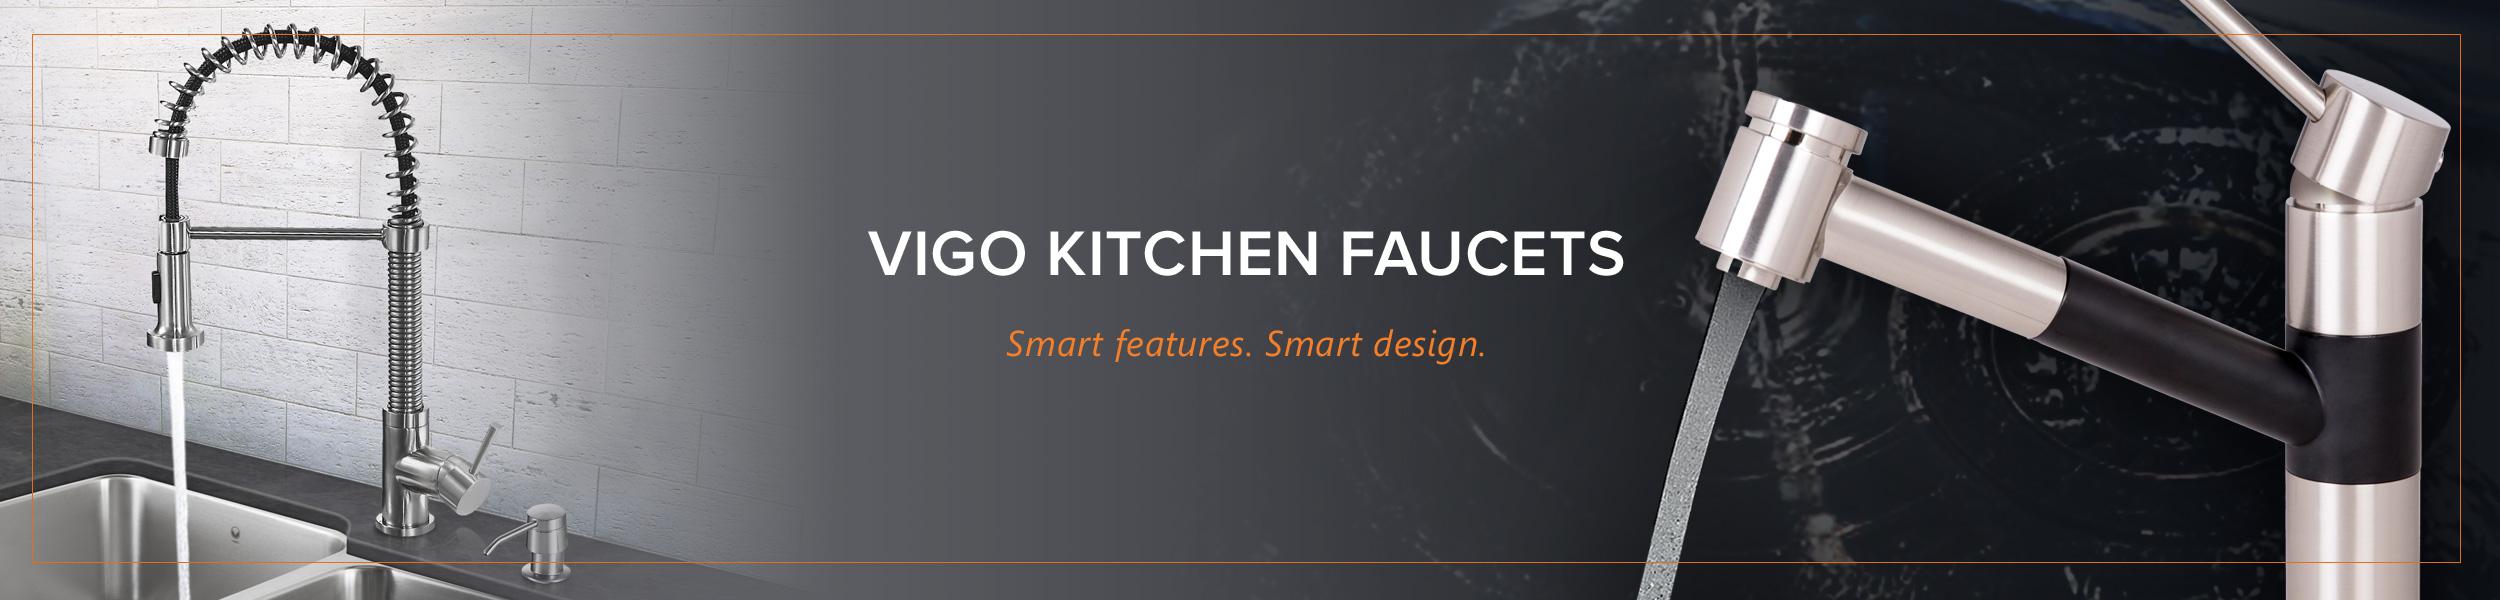 Kitchen Faucets For Kitchen Faucets Kitchen Collection